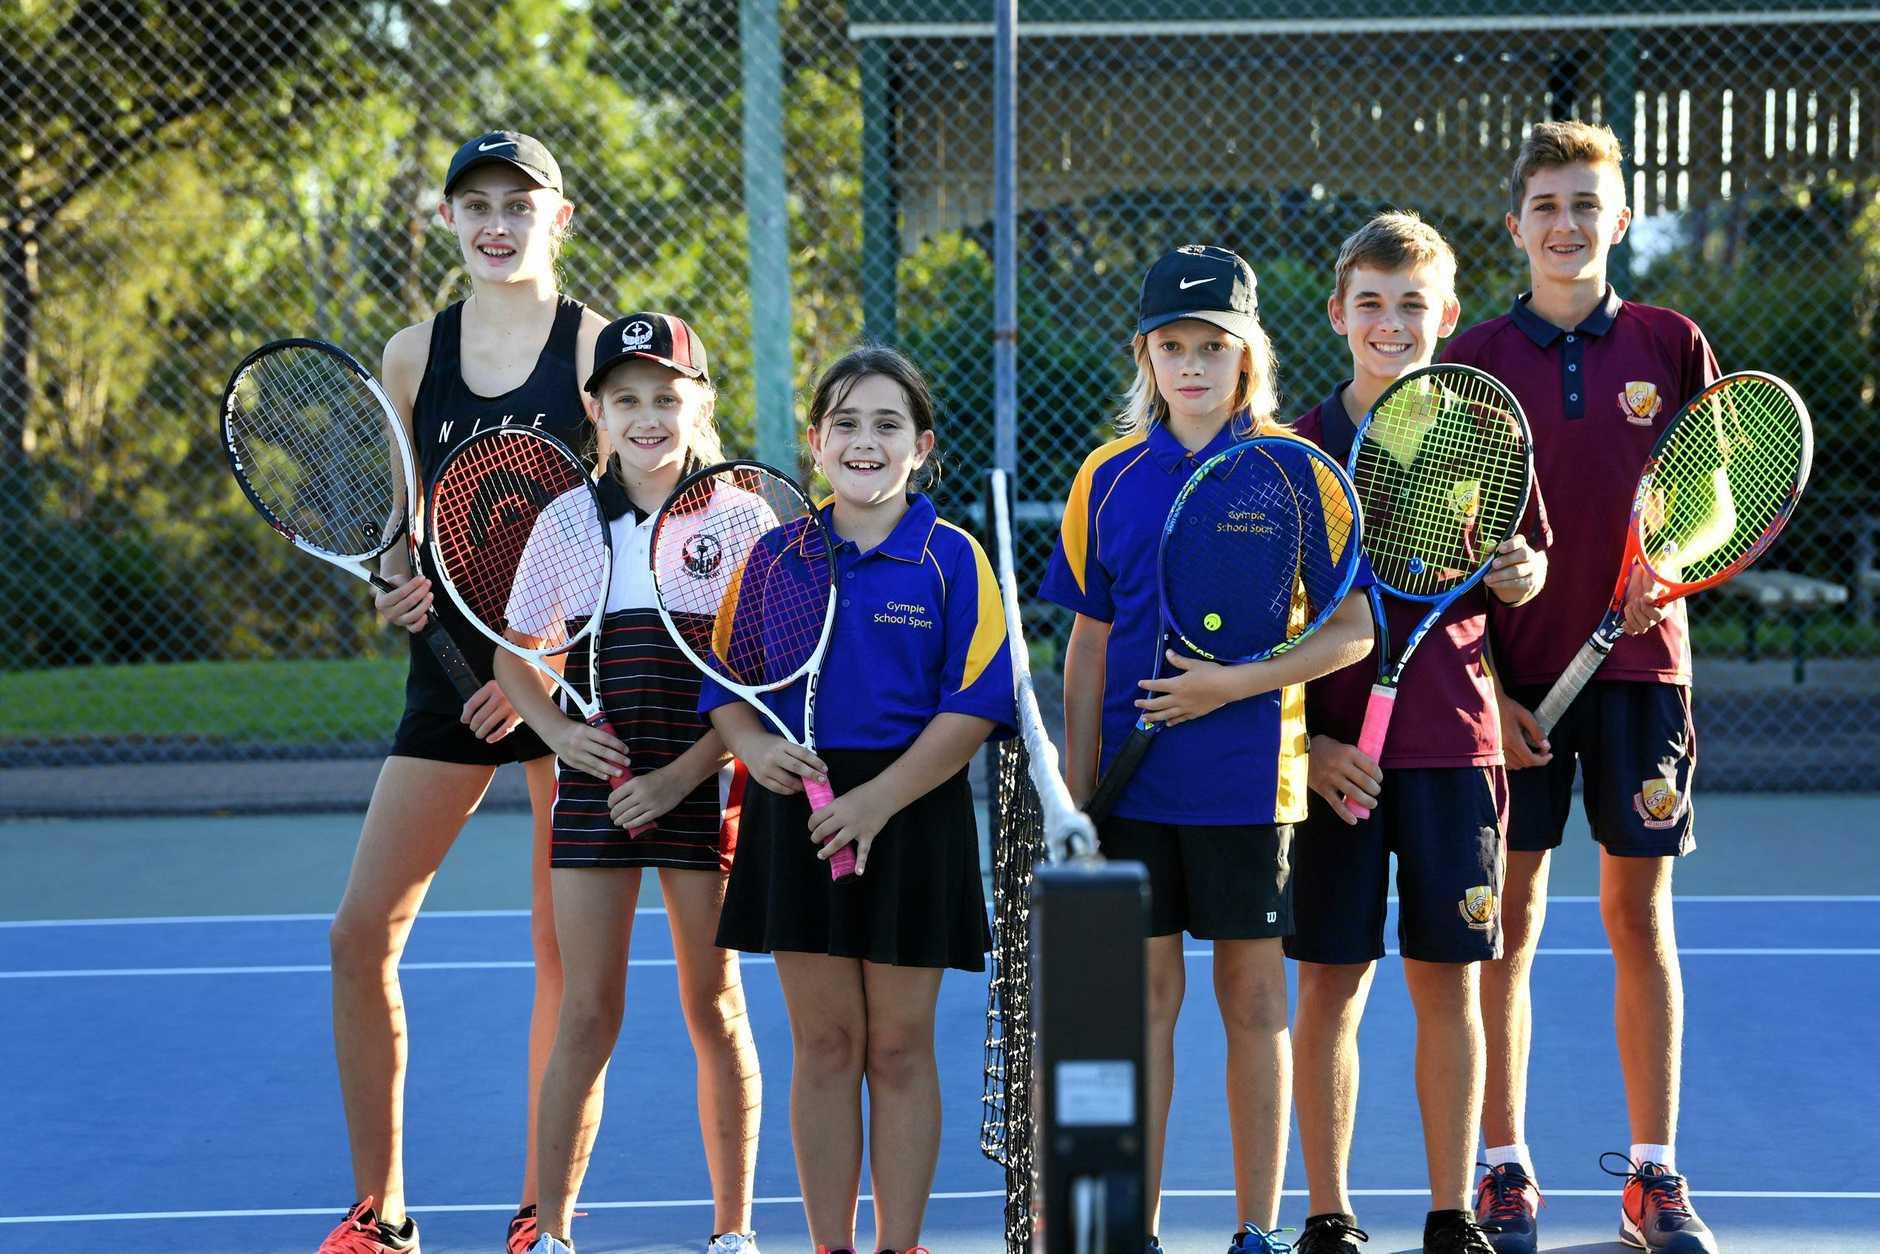 Britney and Dakota Fallon, Mia James, Brodie Fallon, Tanner Cottrill and Sean Lorensen are all fans of Tennis Gympie.